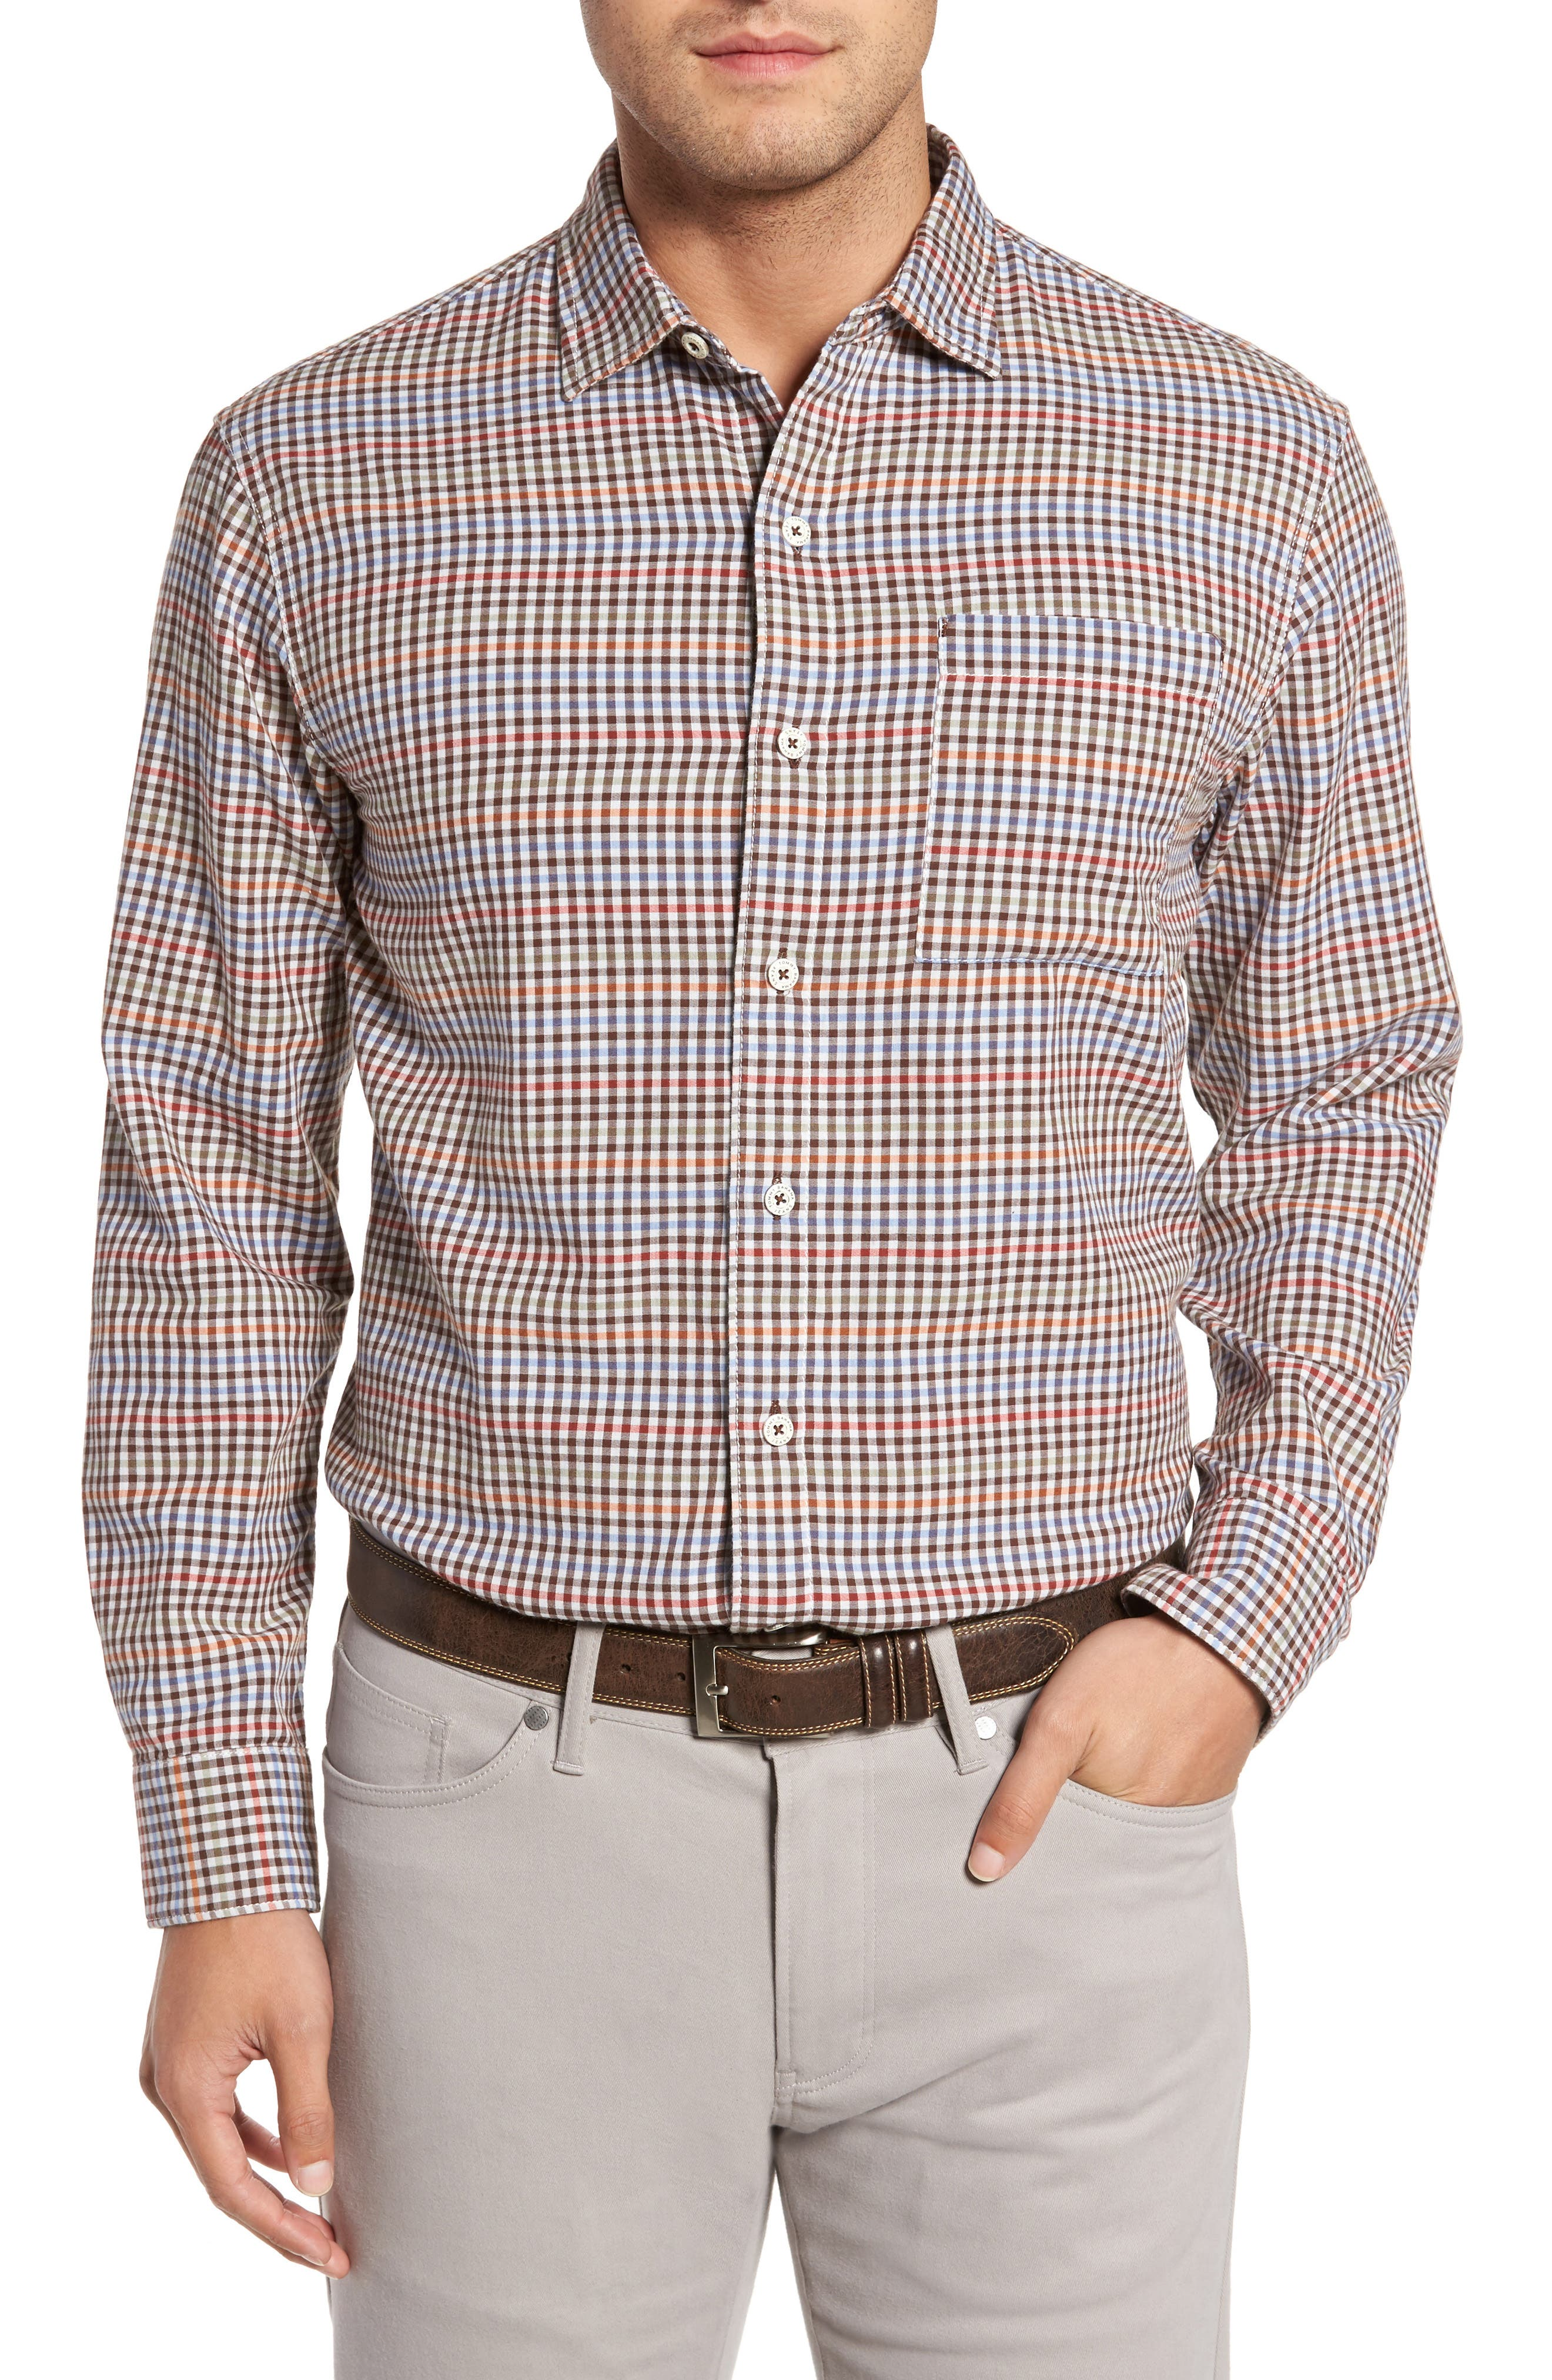 Tan Tan Regular Fit Check Sport Shirt,                             Main thumbnail 1, color,                             050